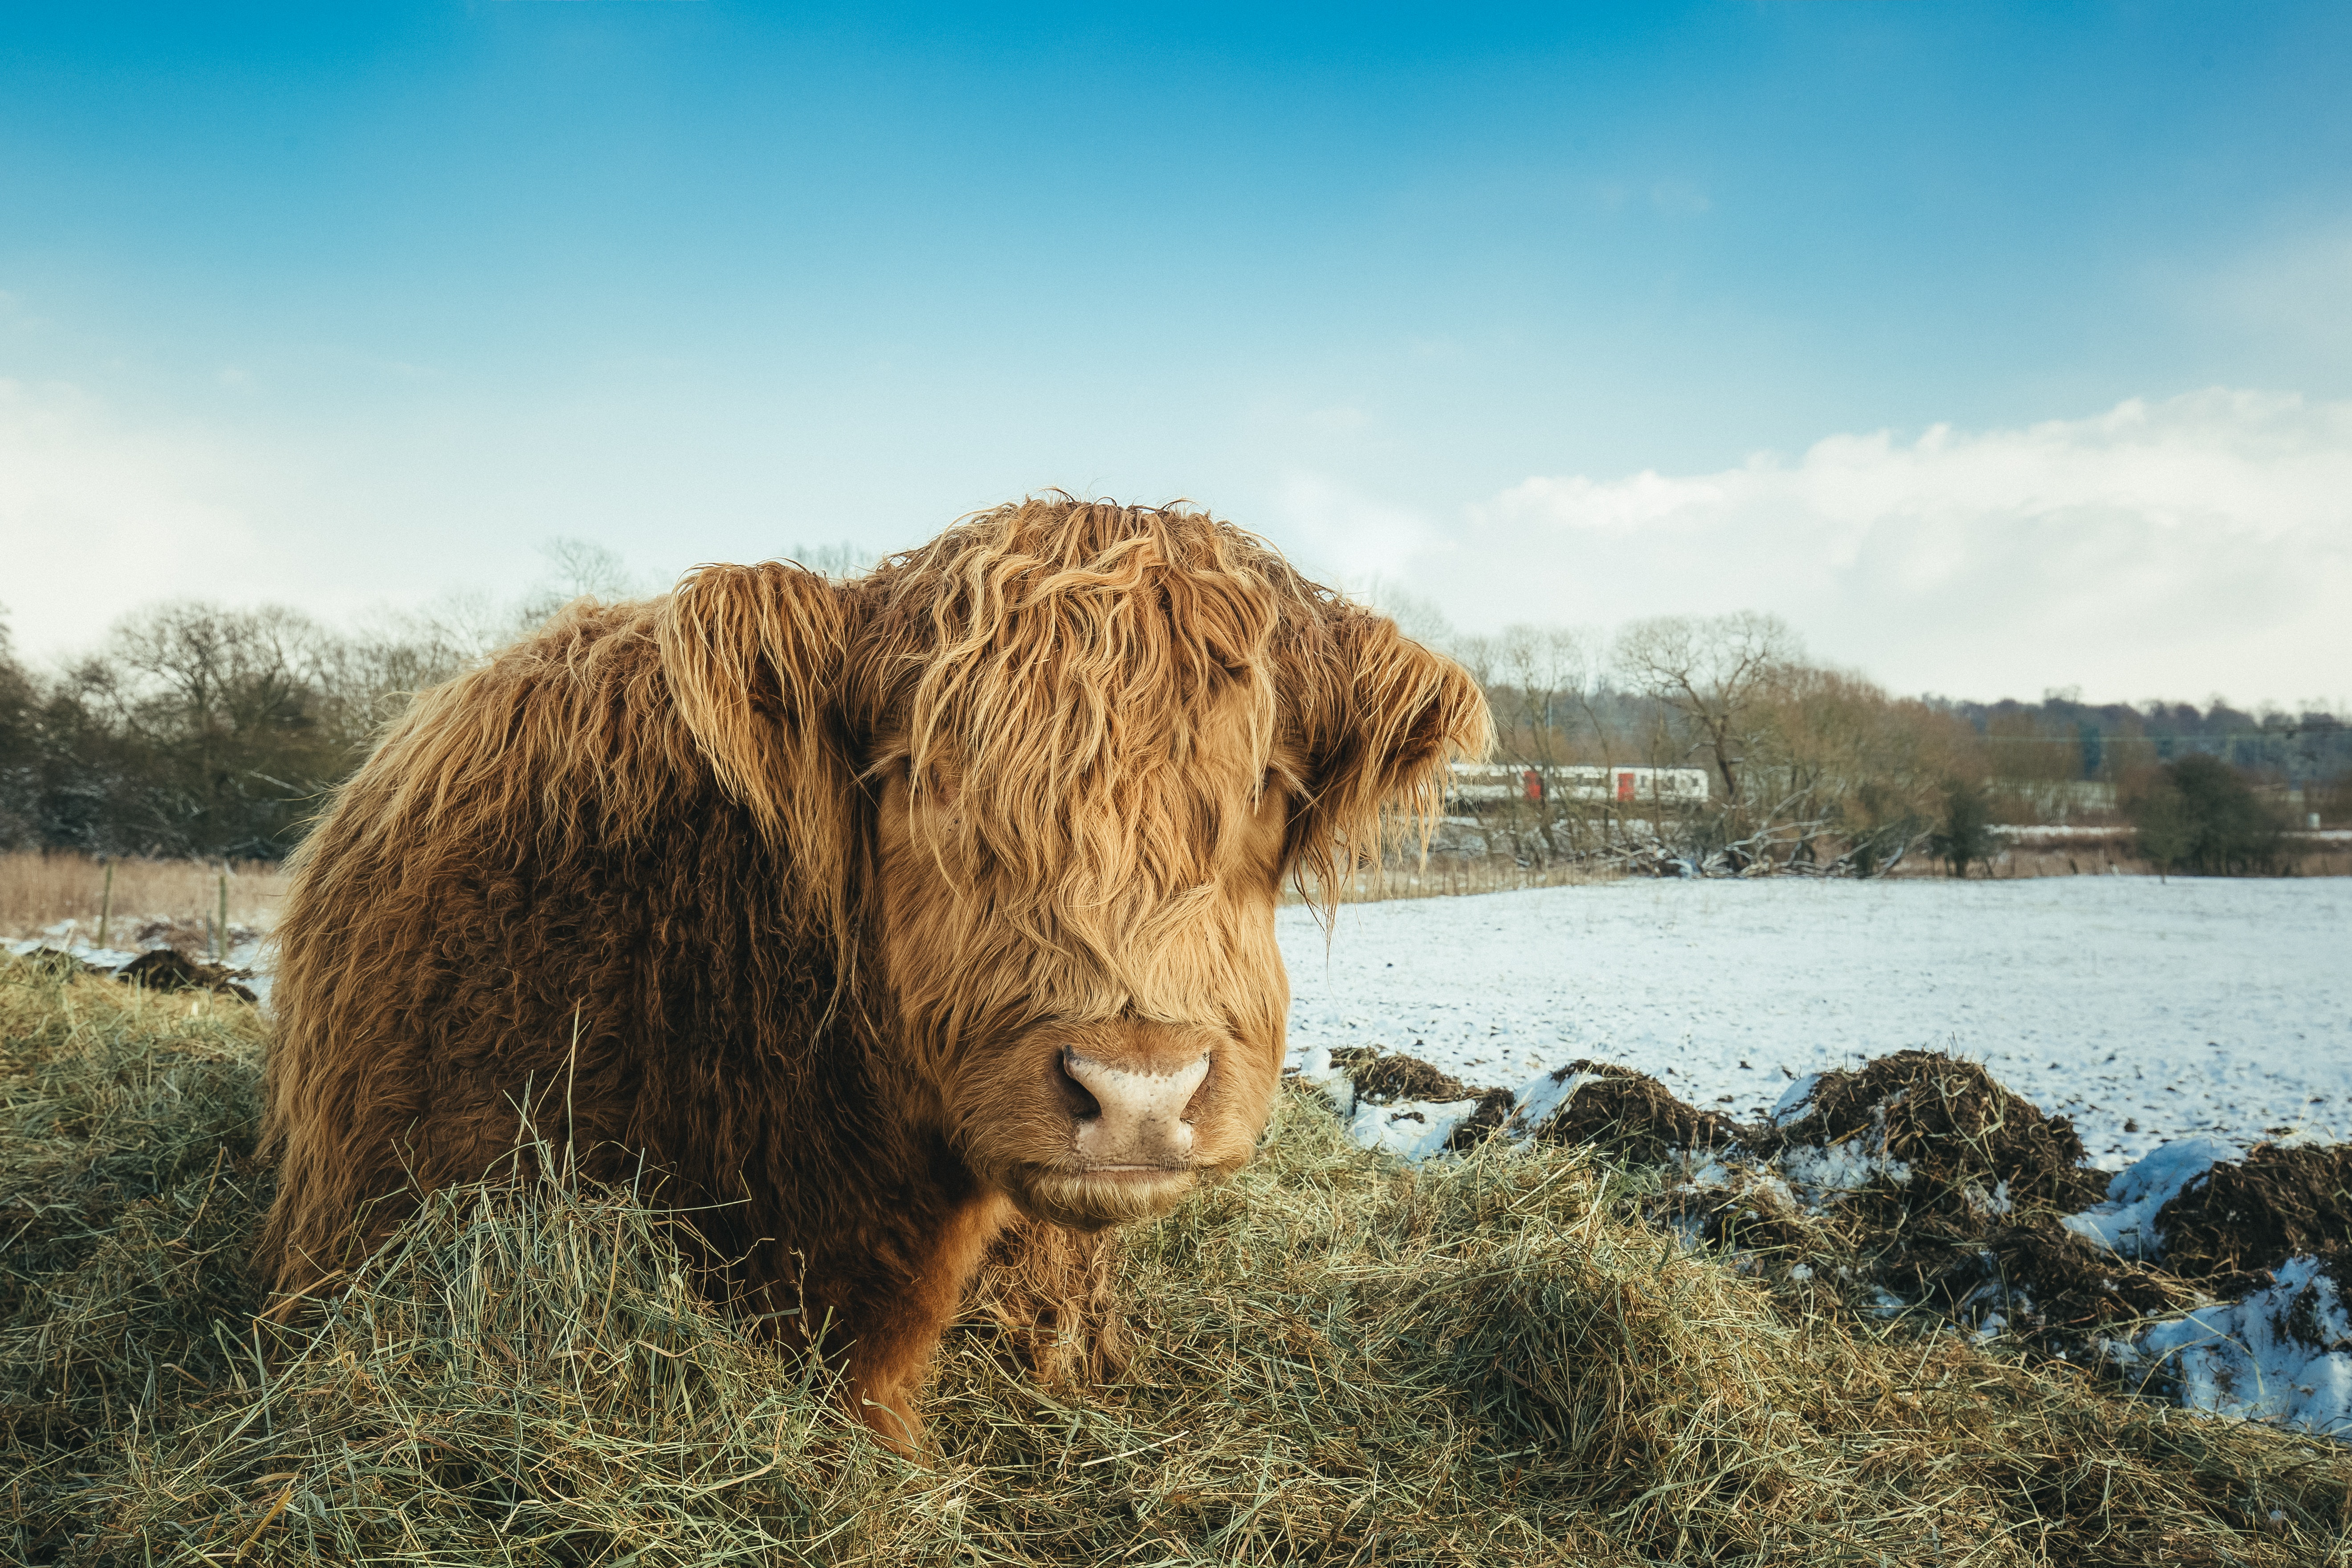 Brown yak on green grass field photo